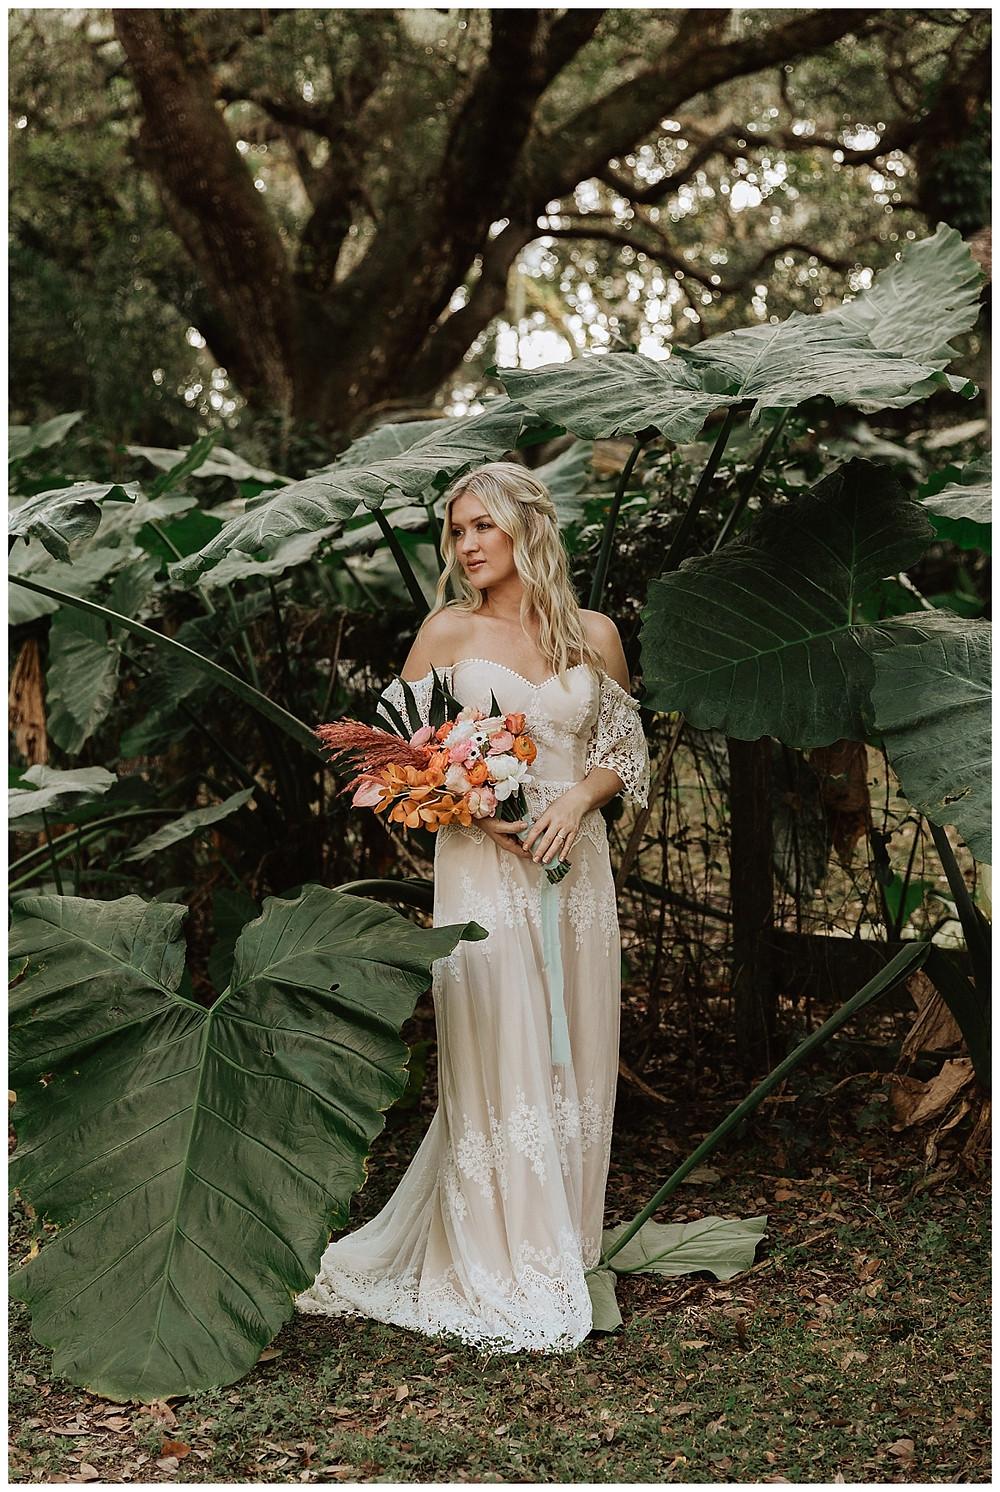 Tropical Bride & Groom Portraits in Ocala Florida